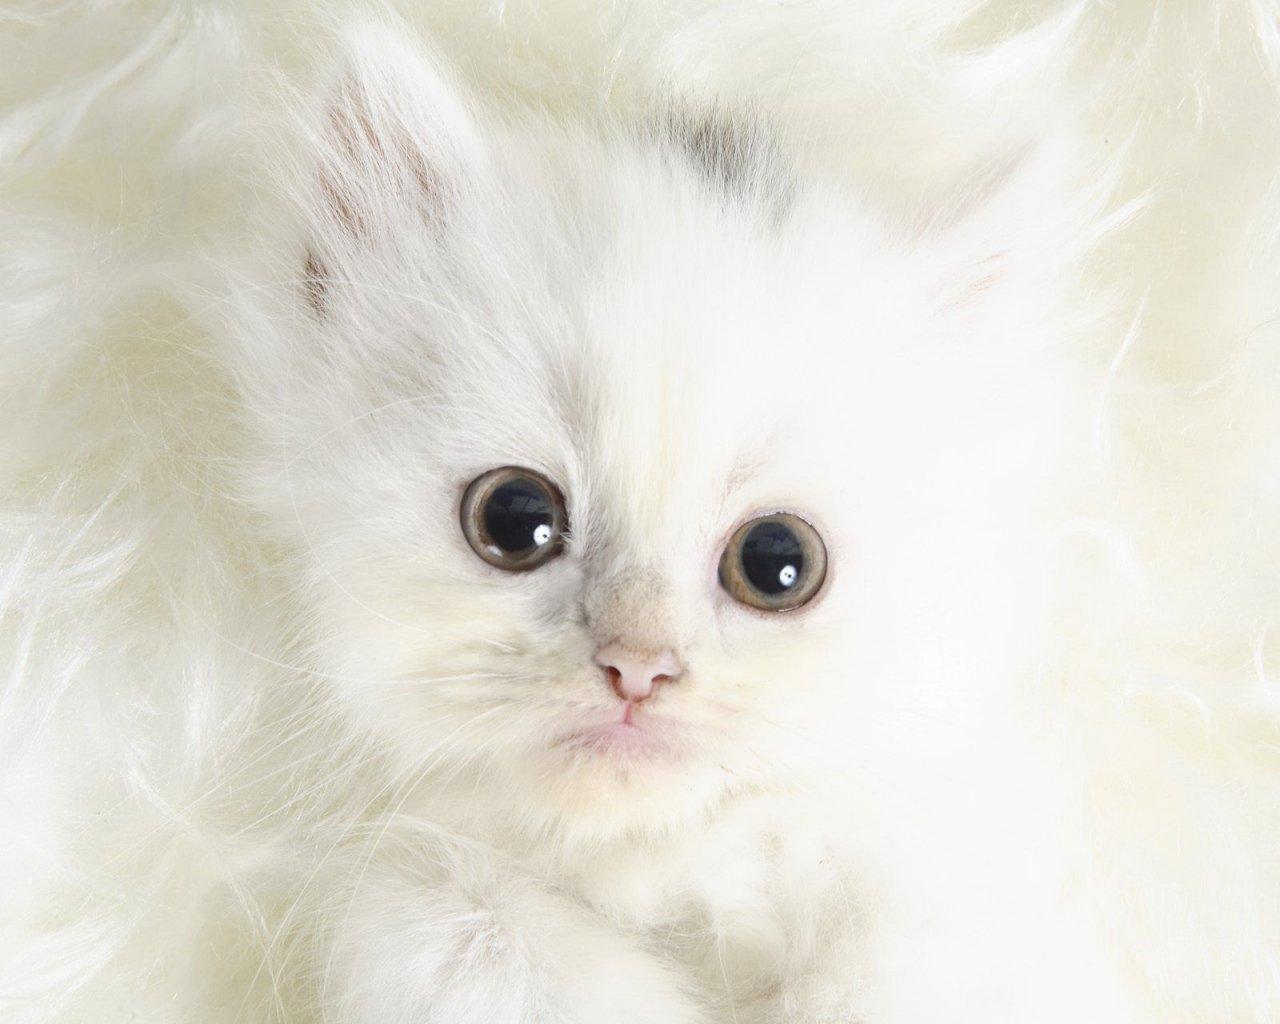 * Gatos Sin Guantes *: Gato Blanco